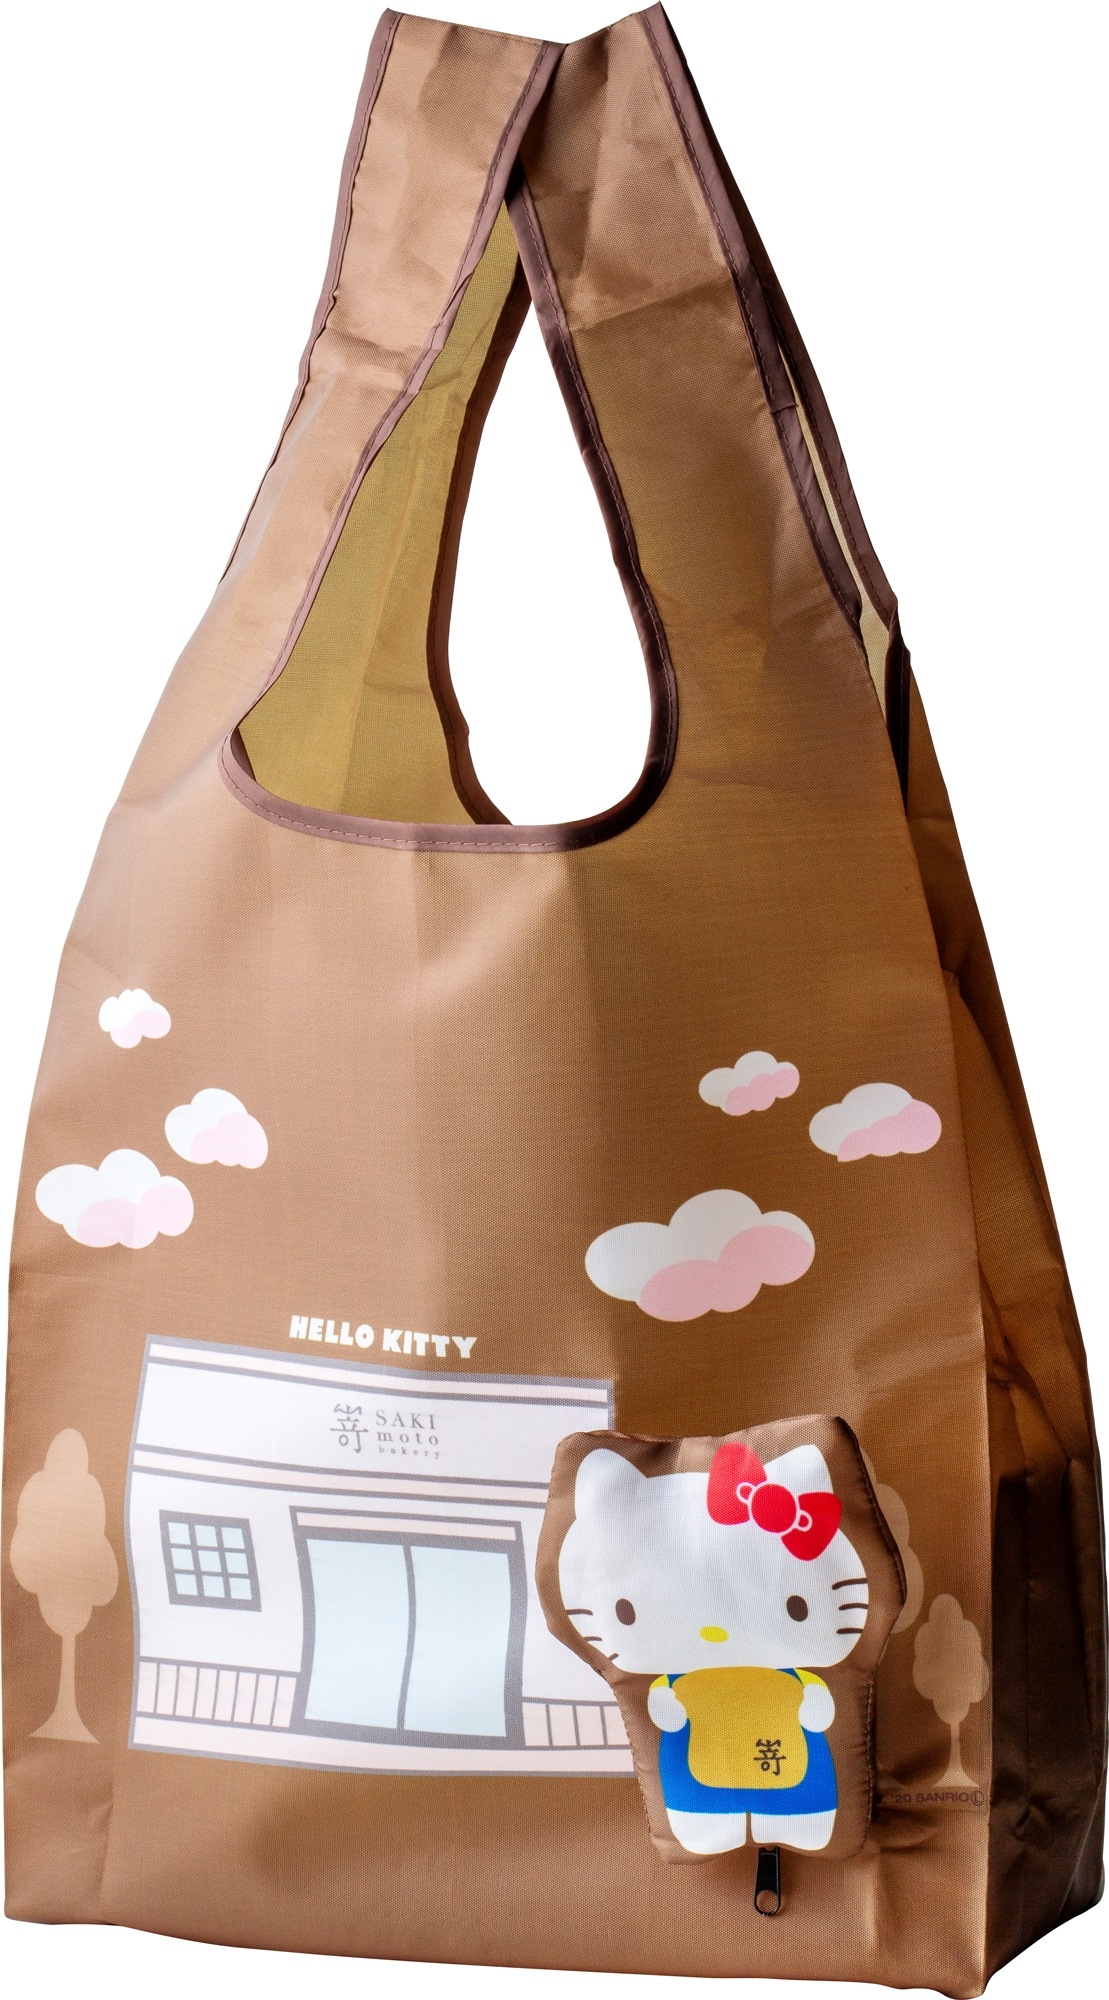 Hello Kitty生吐司來了!嵜本SAKImotoBakery日本限定「極莓果生吐司」凱蒂貓烙印超萌,這天搶先預購